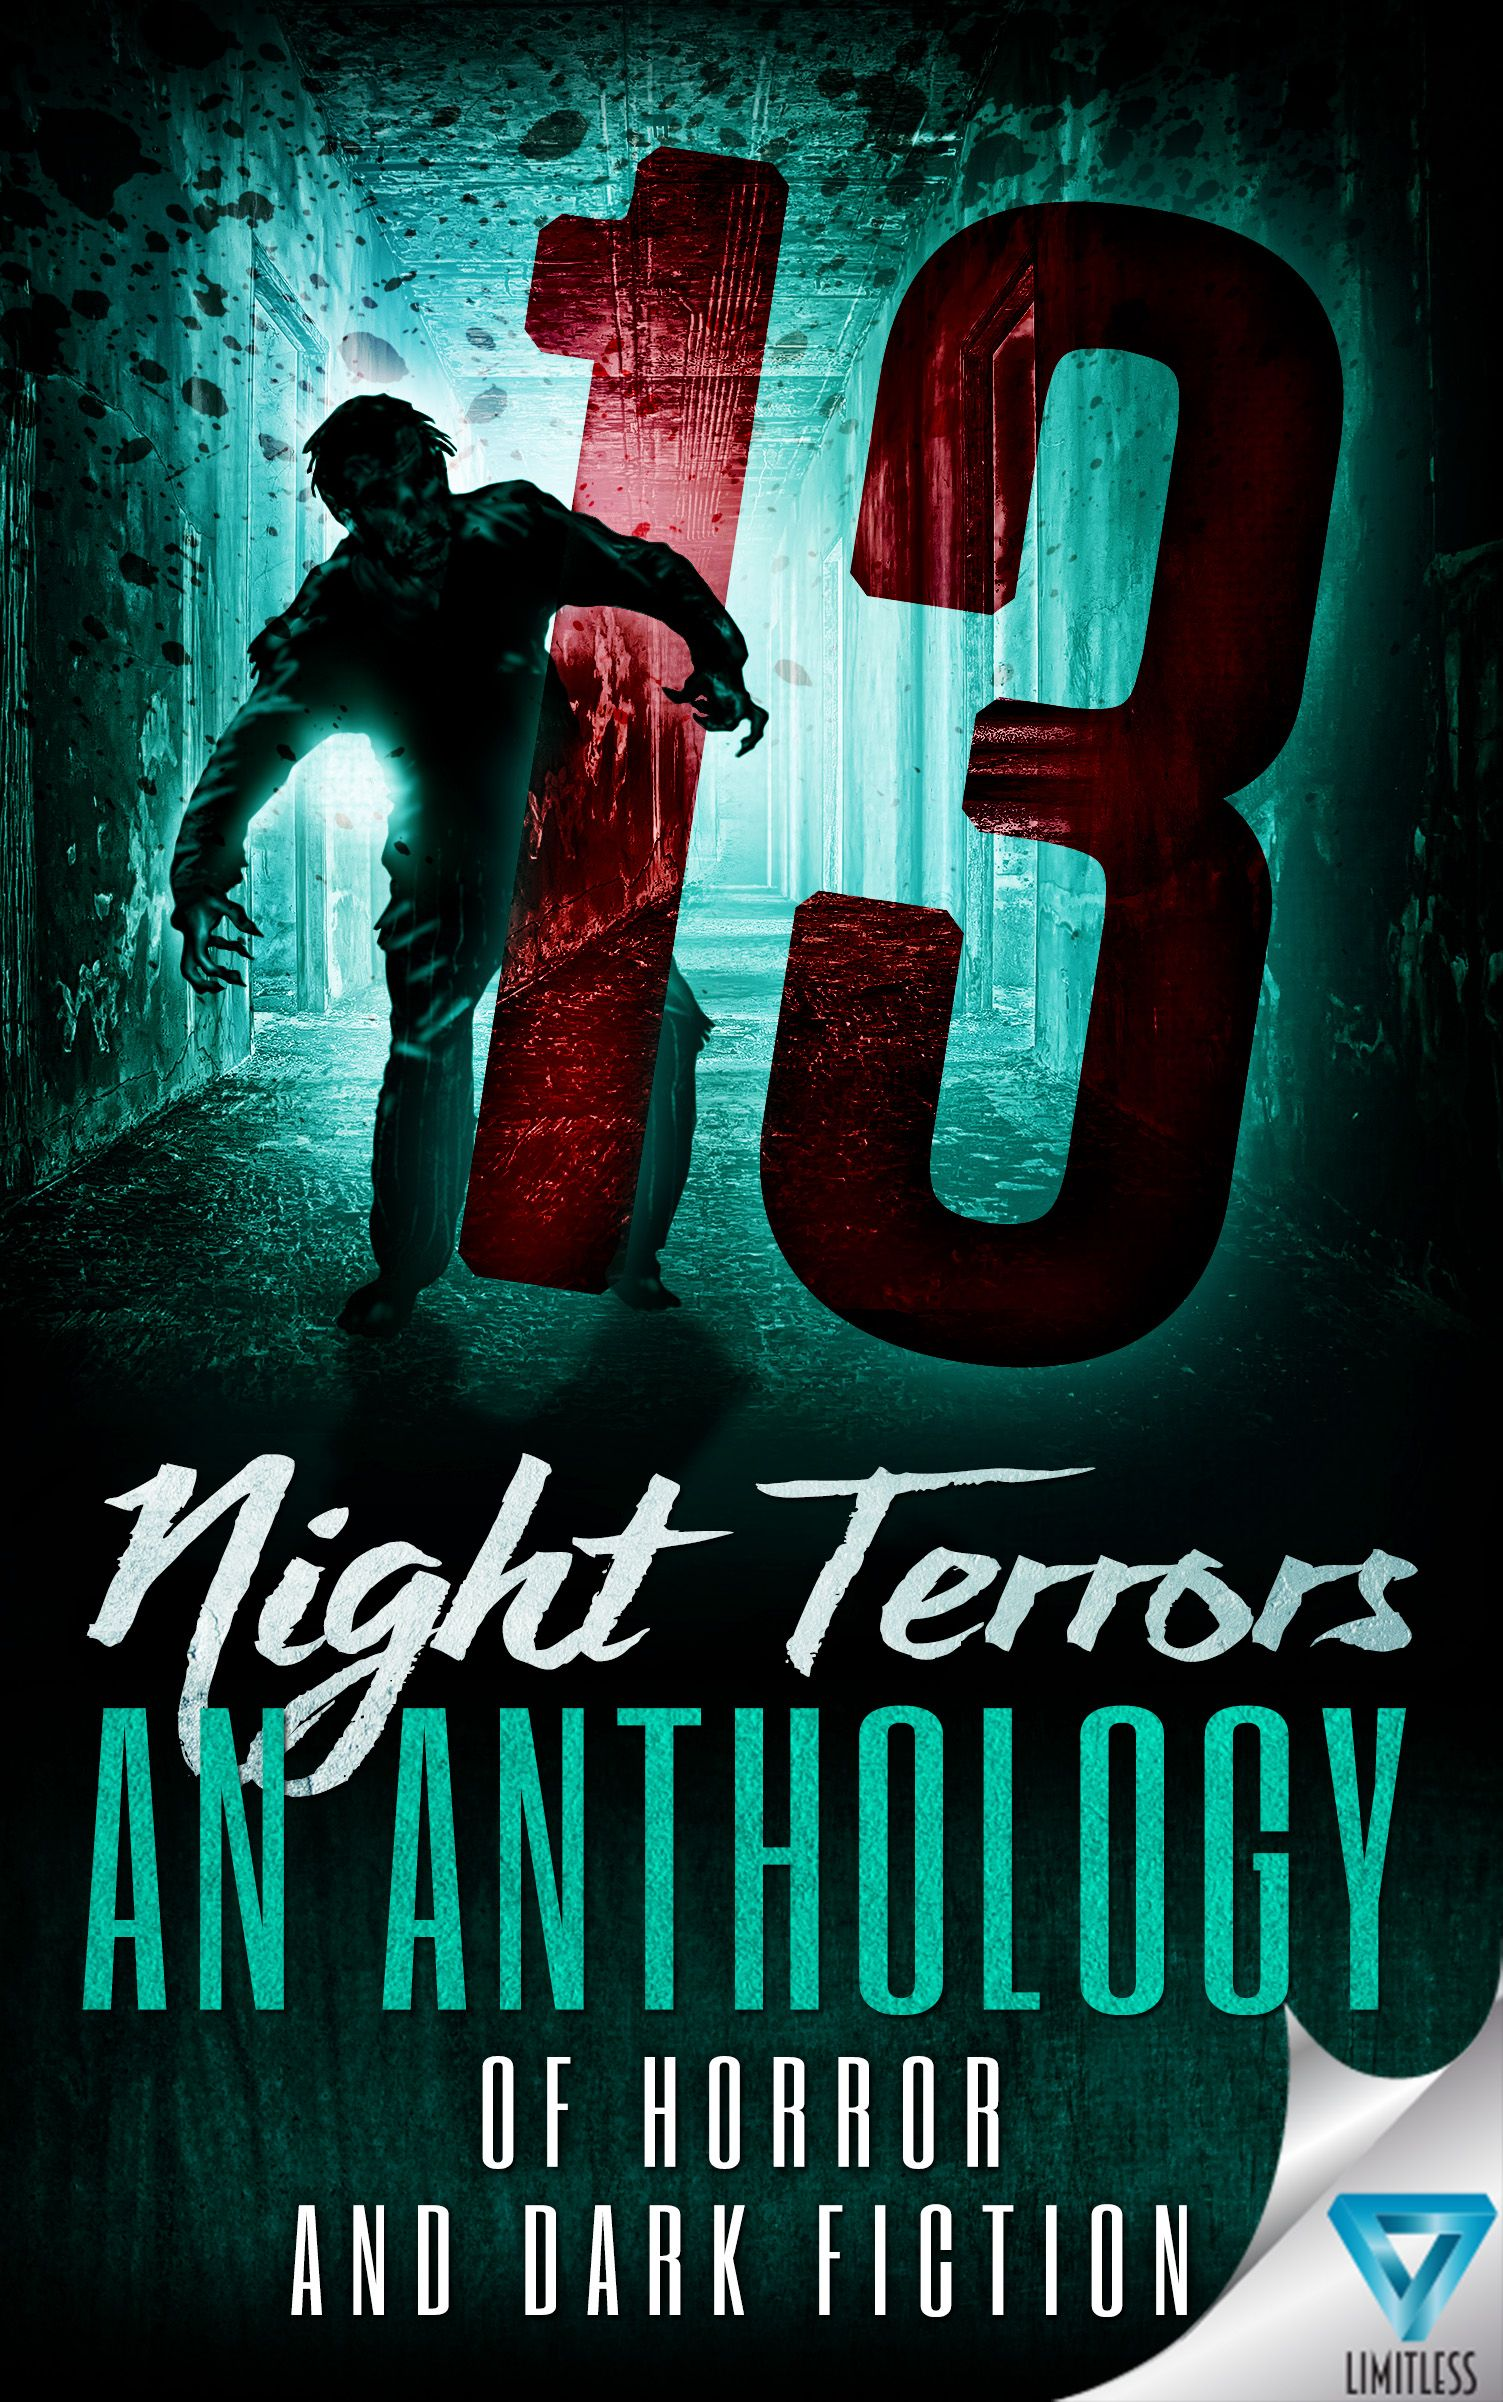 Antology horror book cover design by milo deranged